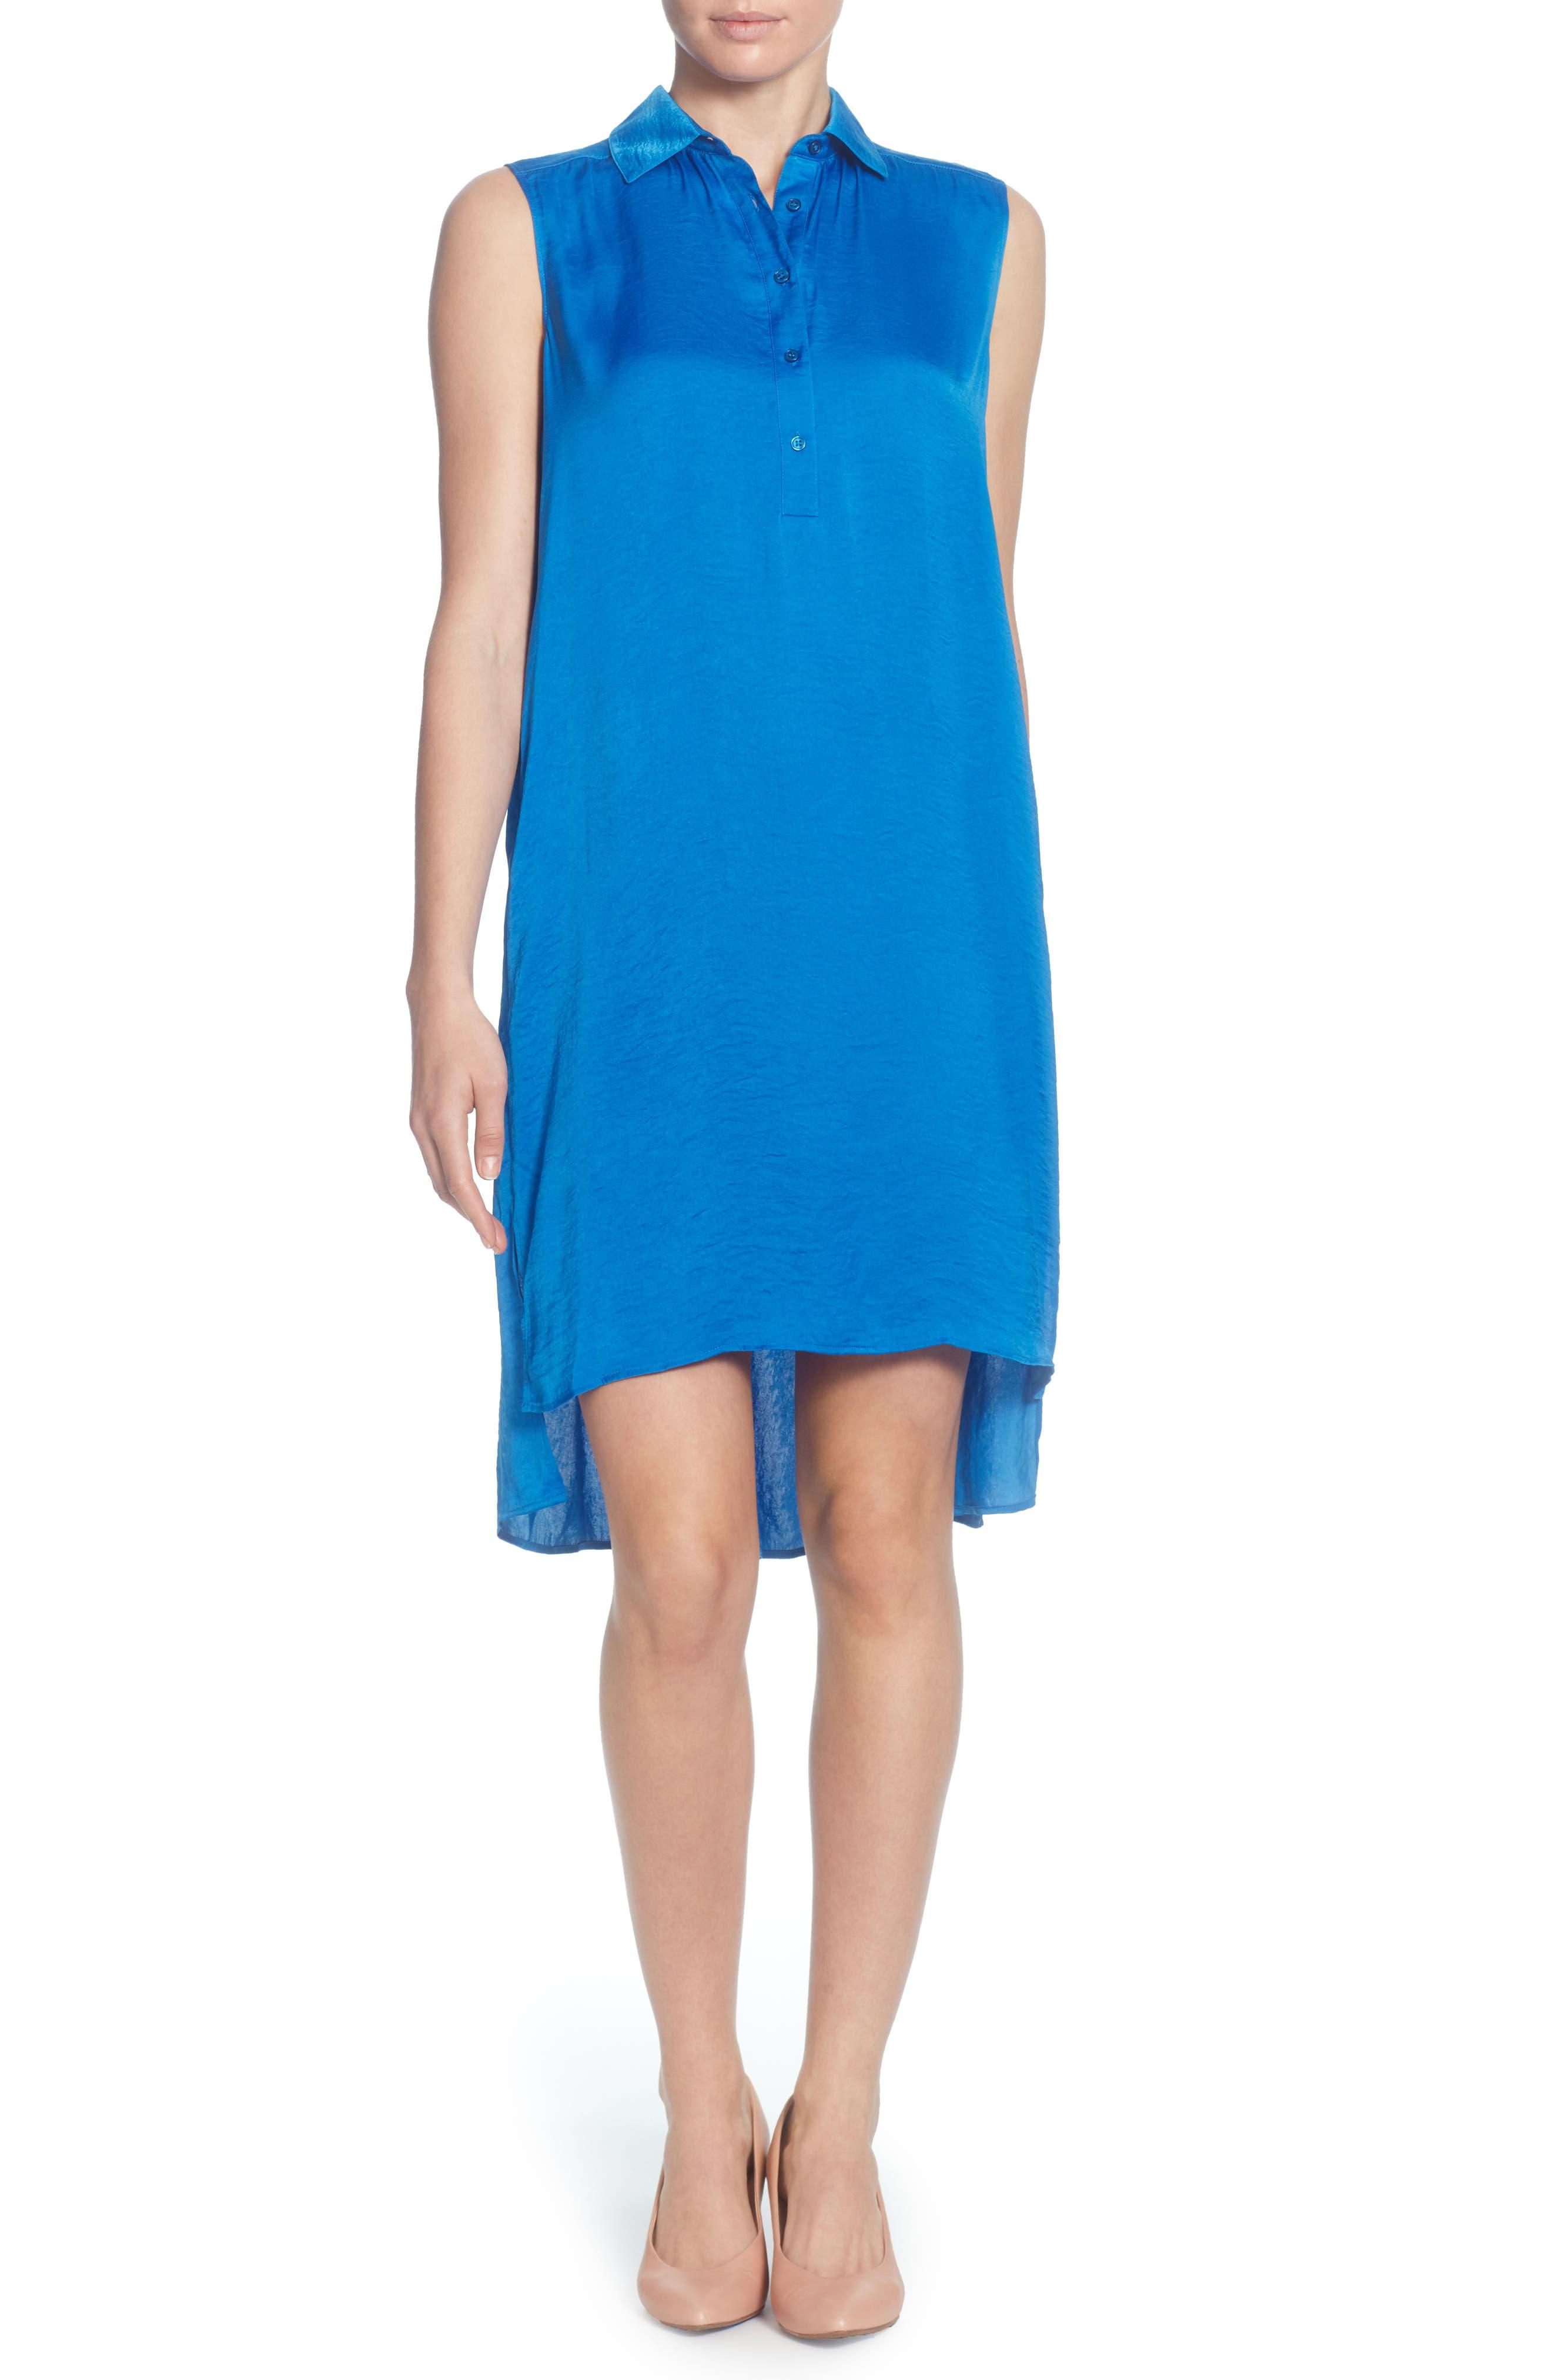 Catherine Catherine Malandrino Stella High/low Tunic Top, Blue